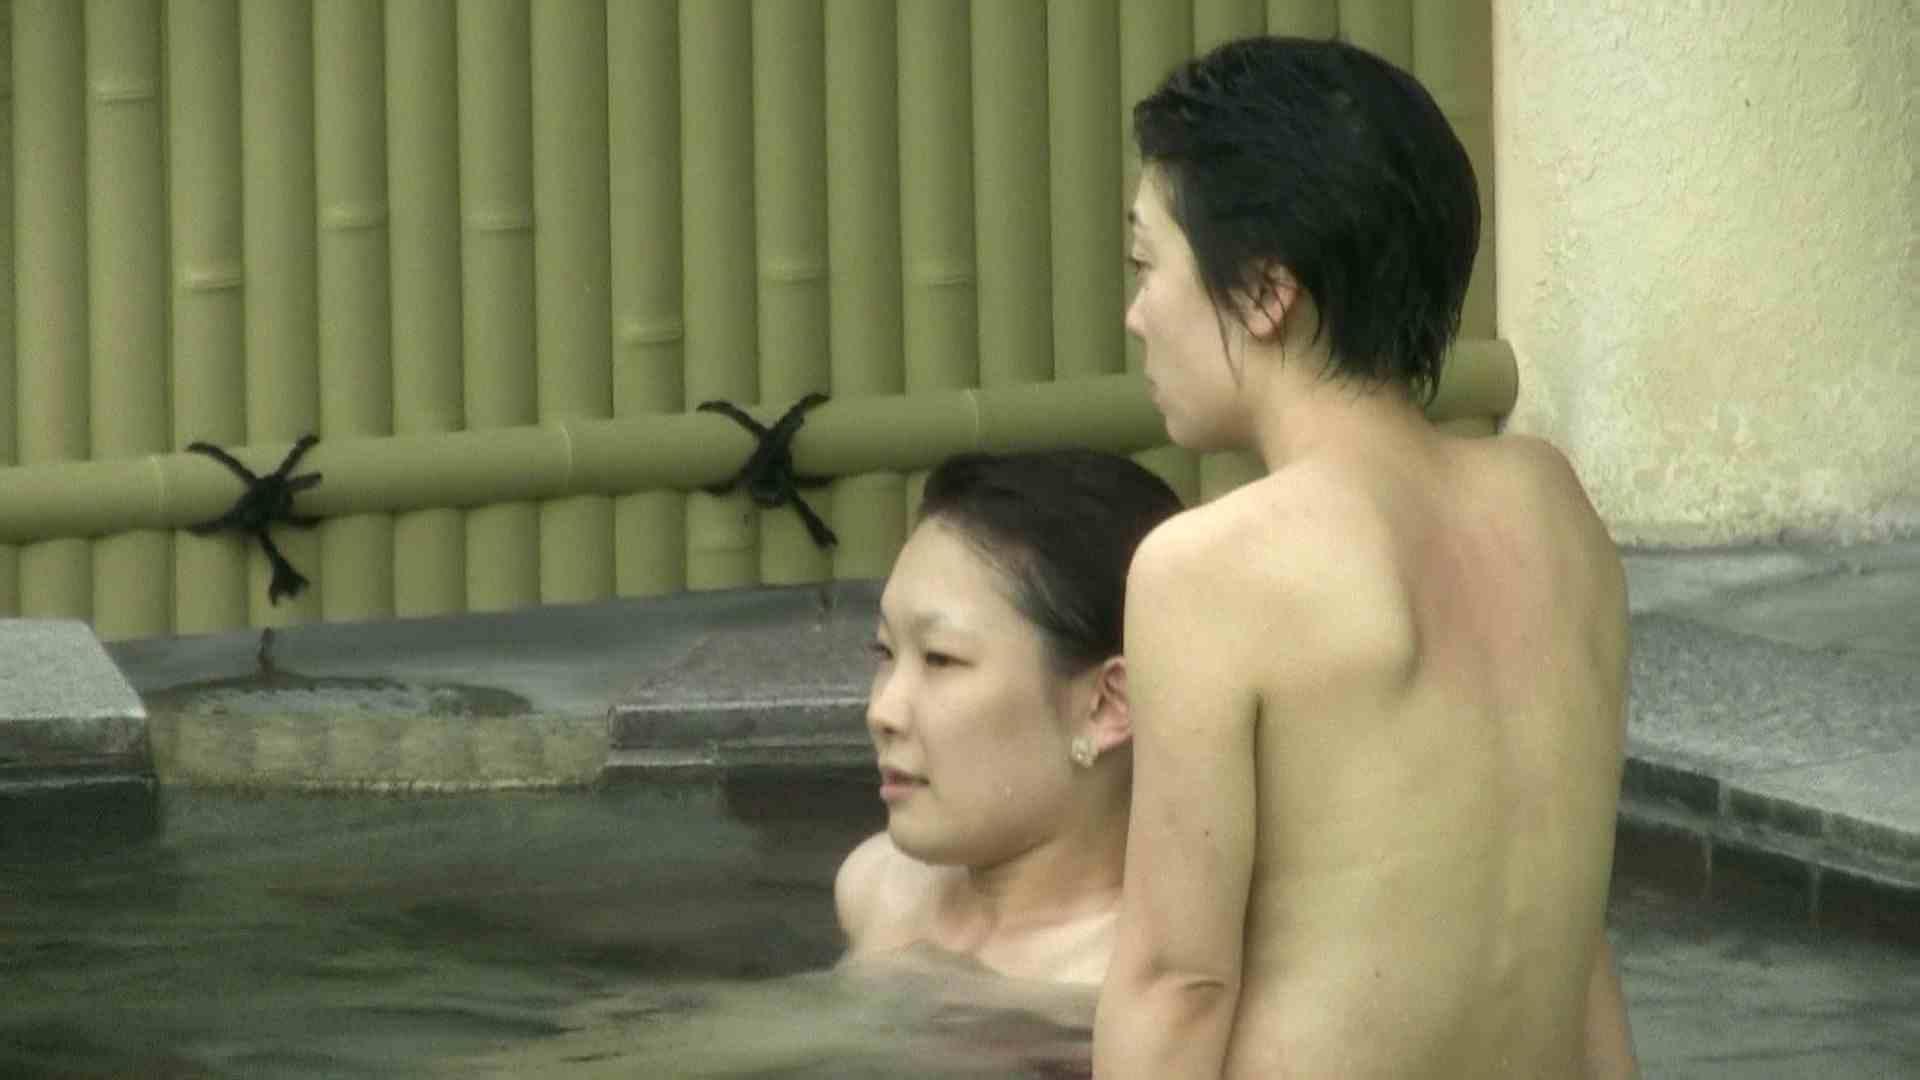 Aquaな露天風呂Vol.670 いやらしいOL アダルト動画キャプチャ 81連発 57